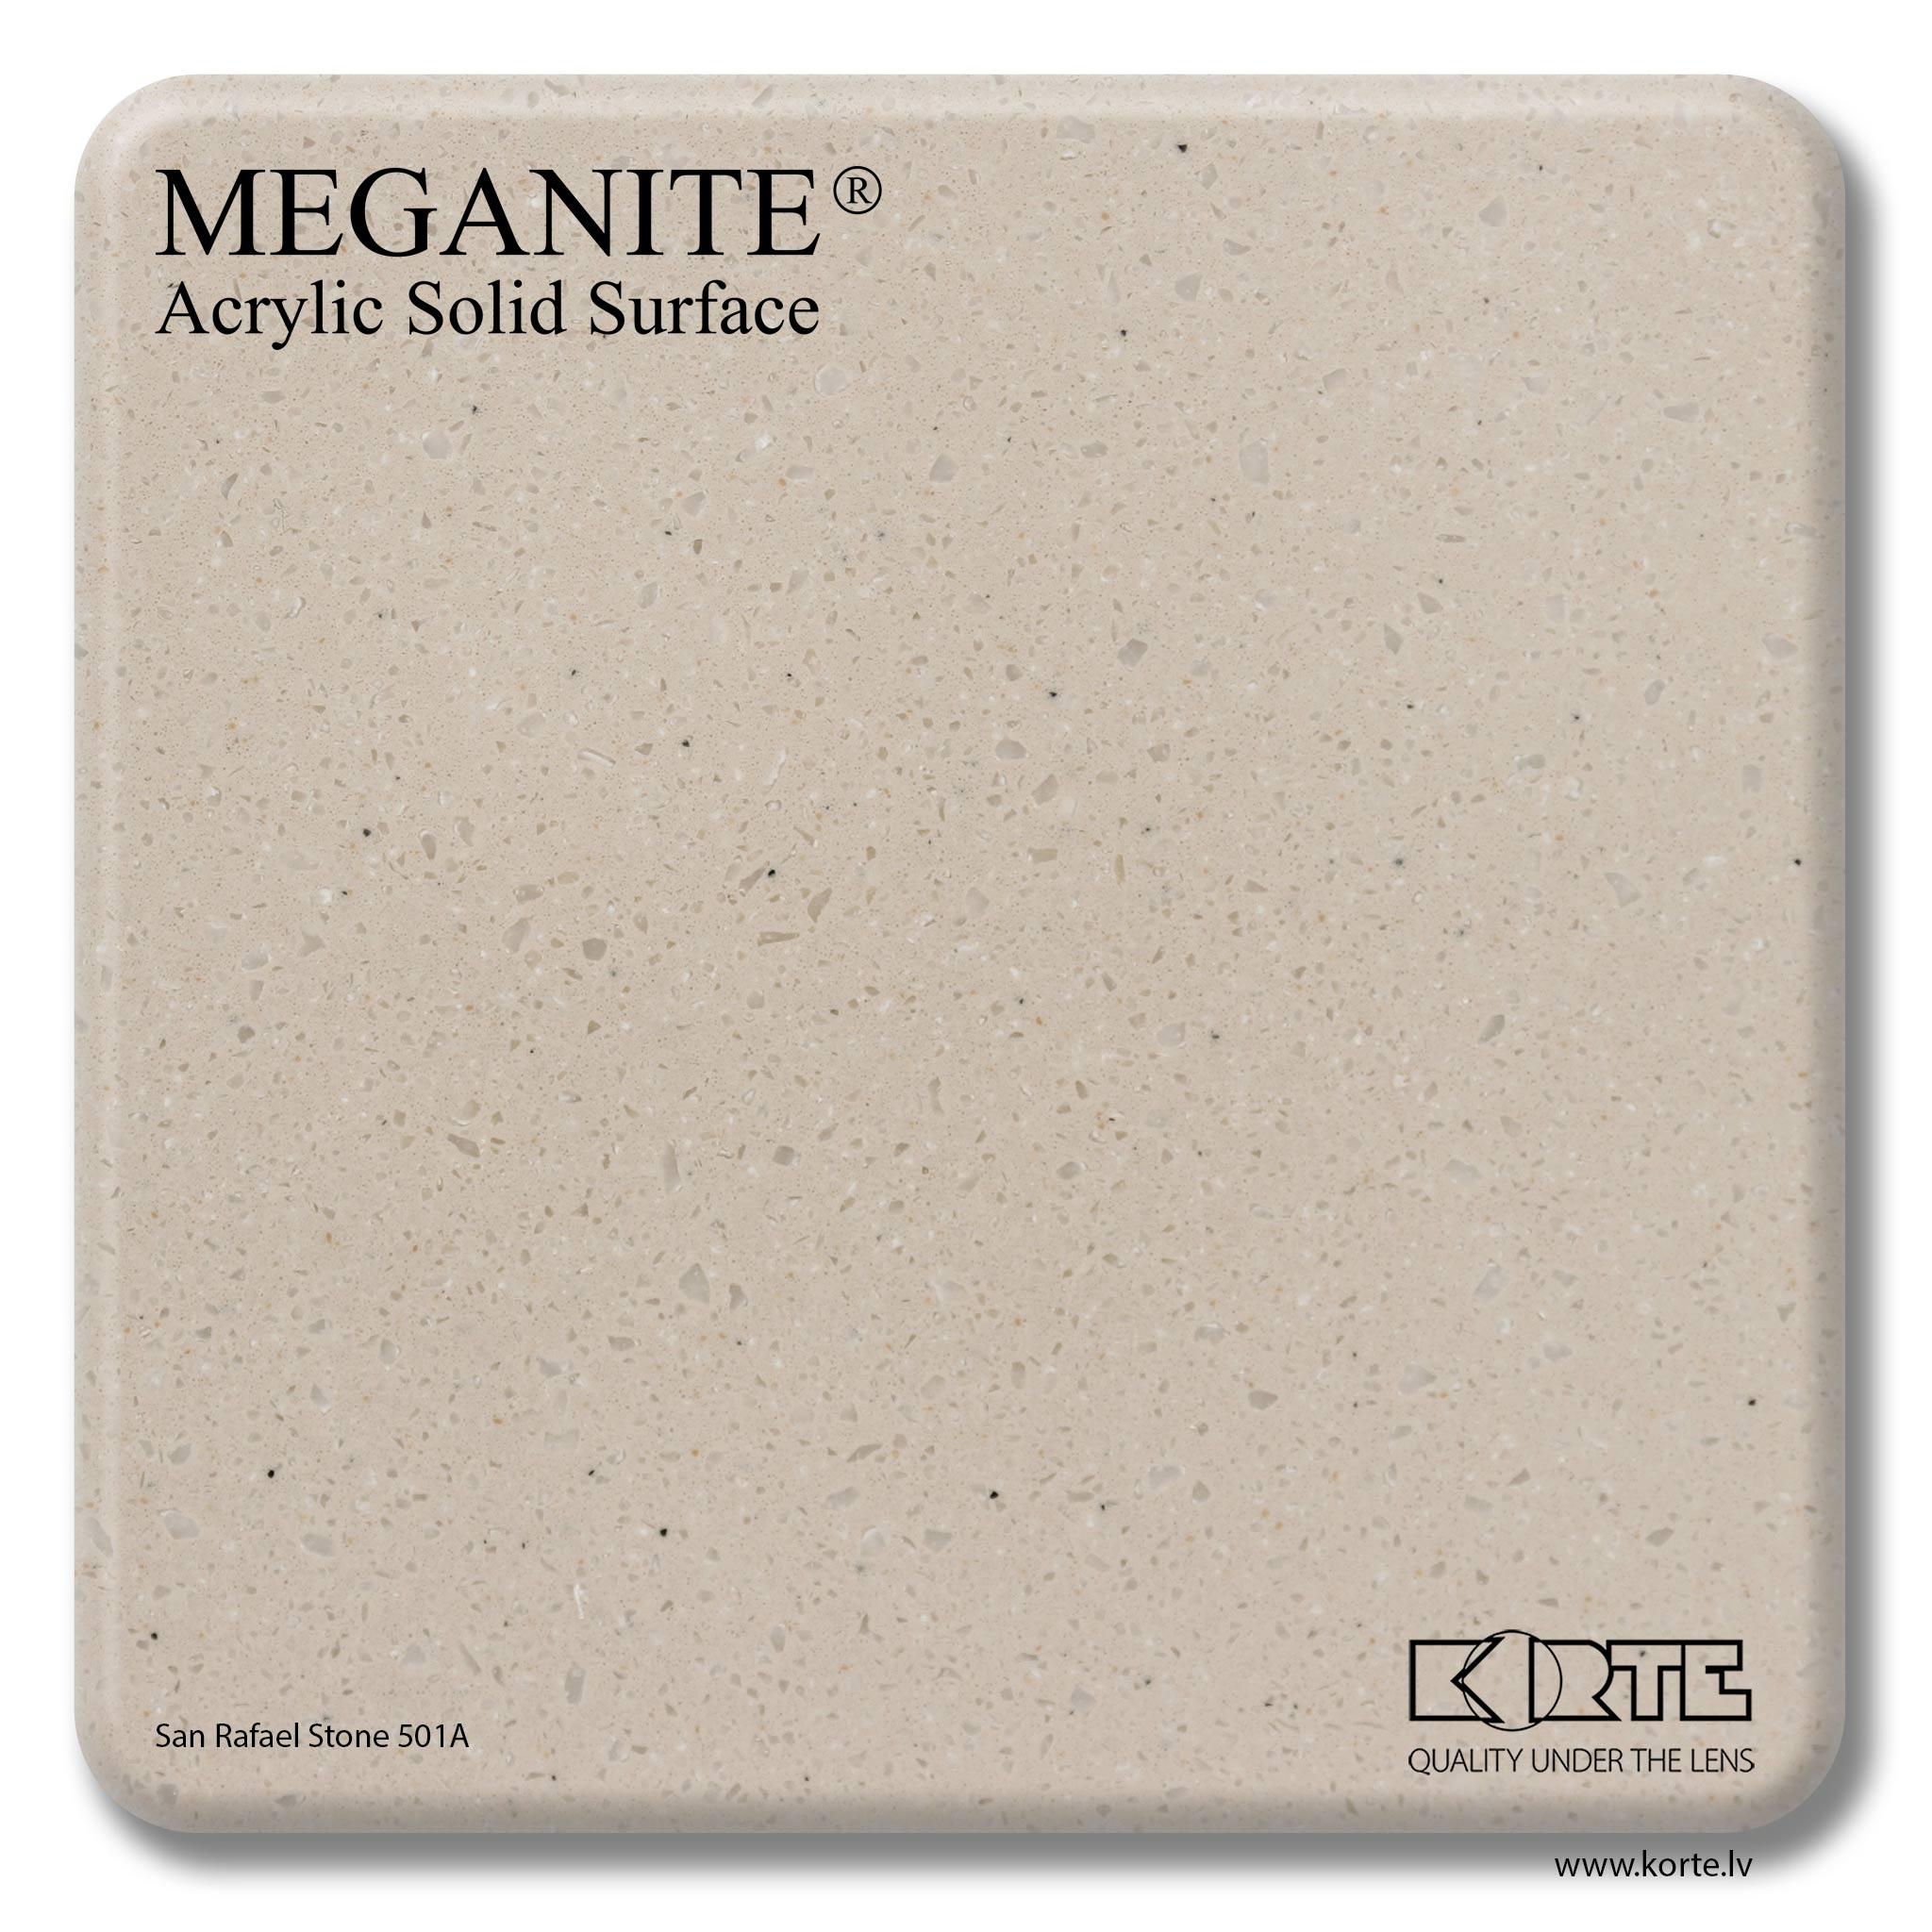 Meganite San Rafael Stone 501A